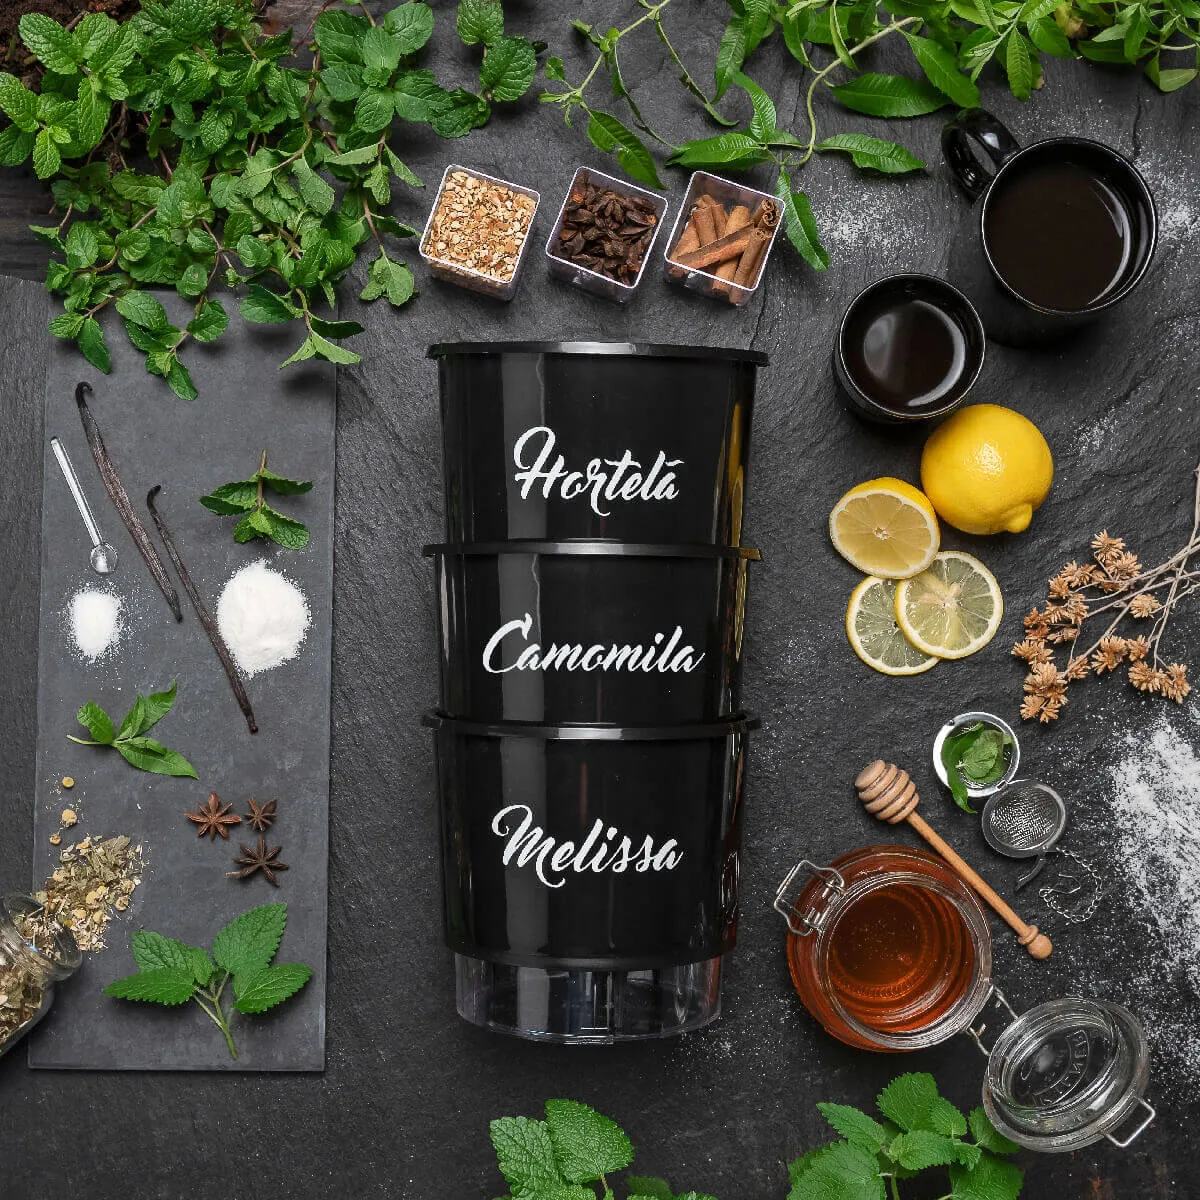 Kit Plantio Completo Gourmet Chás  - Vasos Raiz Loja Oficial